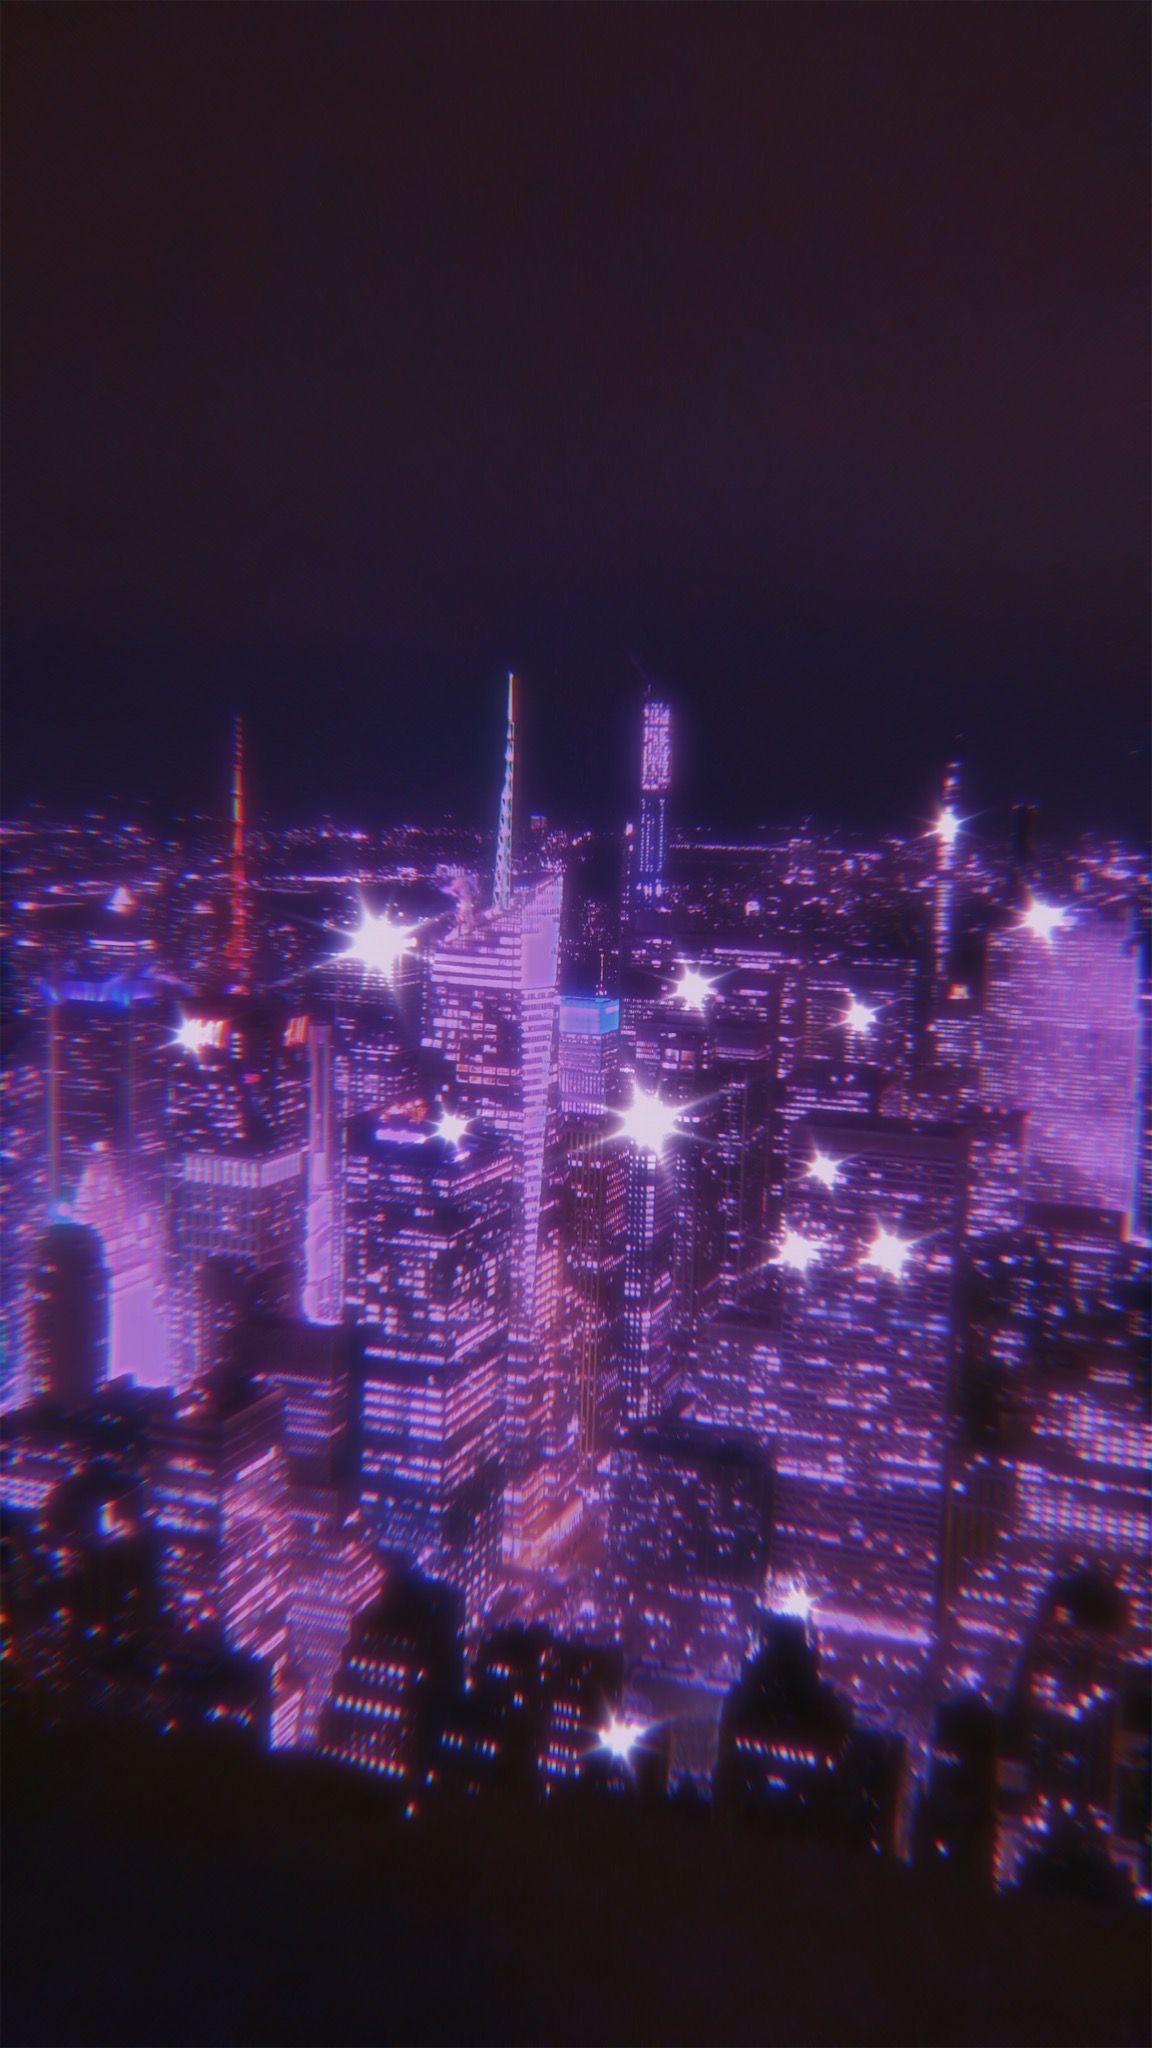 New York City Aesthetic Backgrounds Sky Aesthetic Purple Aesthetic Dark purple aesthetic wallpaper city